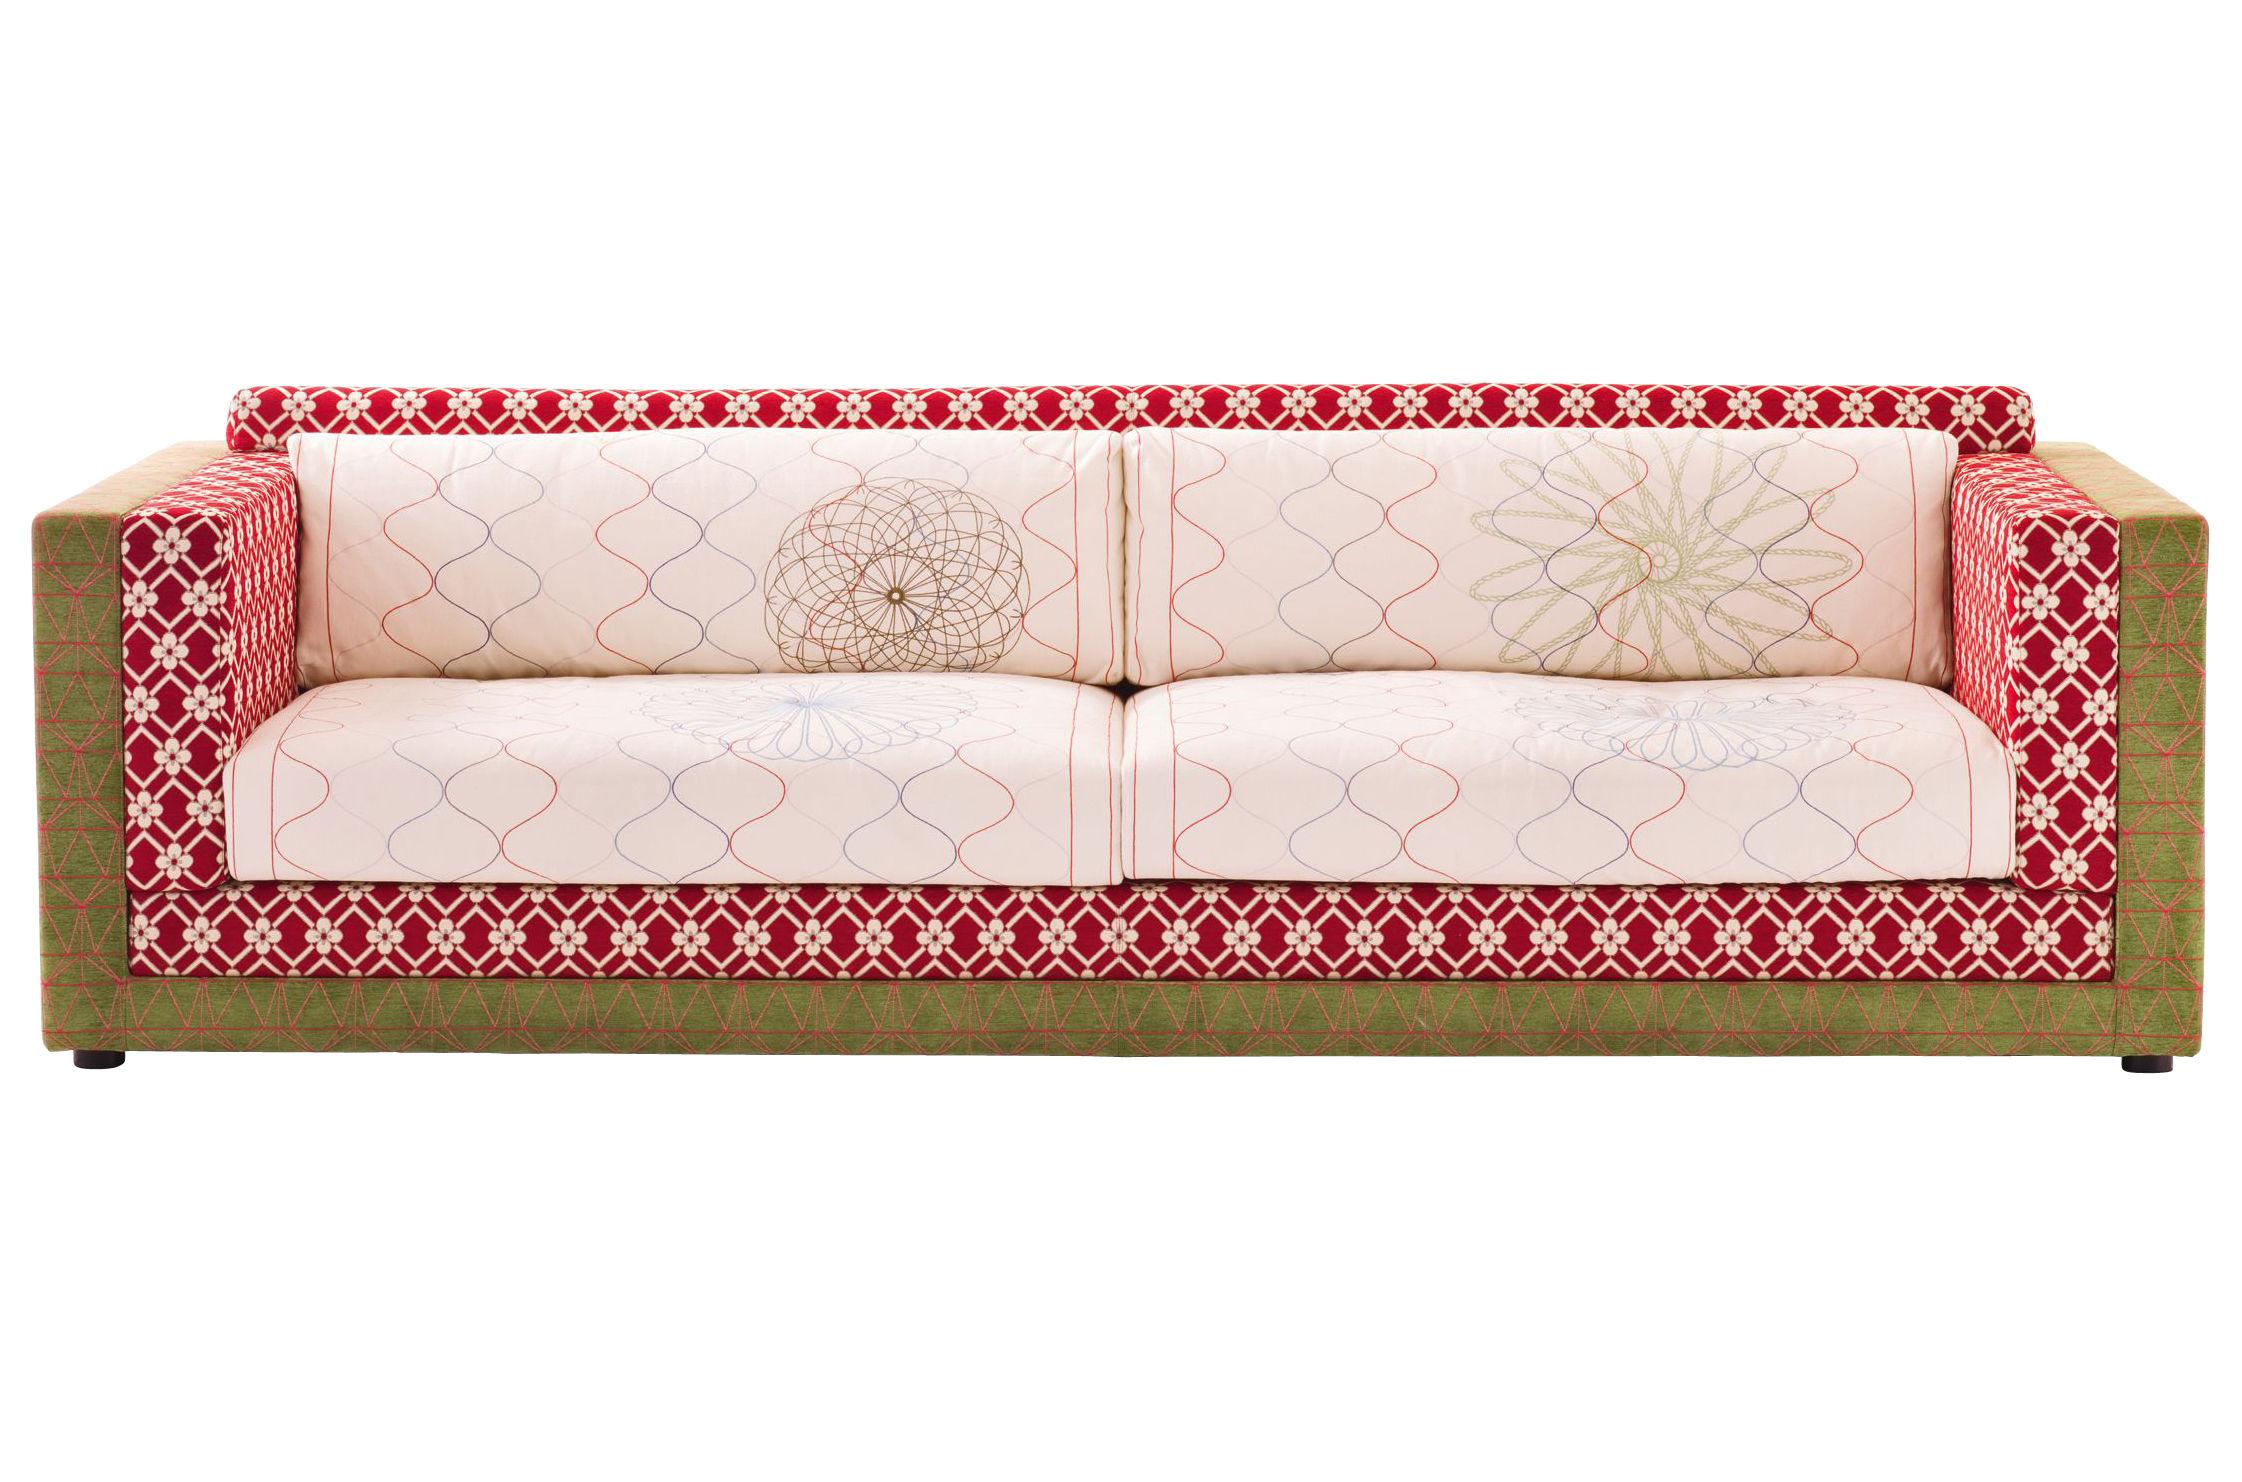 Arredamento - Divani moderni - Divano destro Sushi - Karmakoma - 3 posti di Moroso - L 210 cm - Bianco, rosso e verde - Tessuto